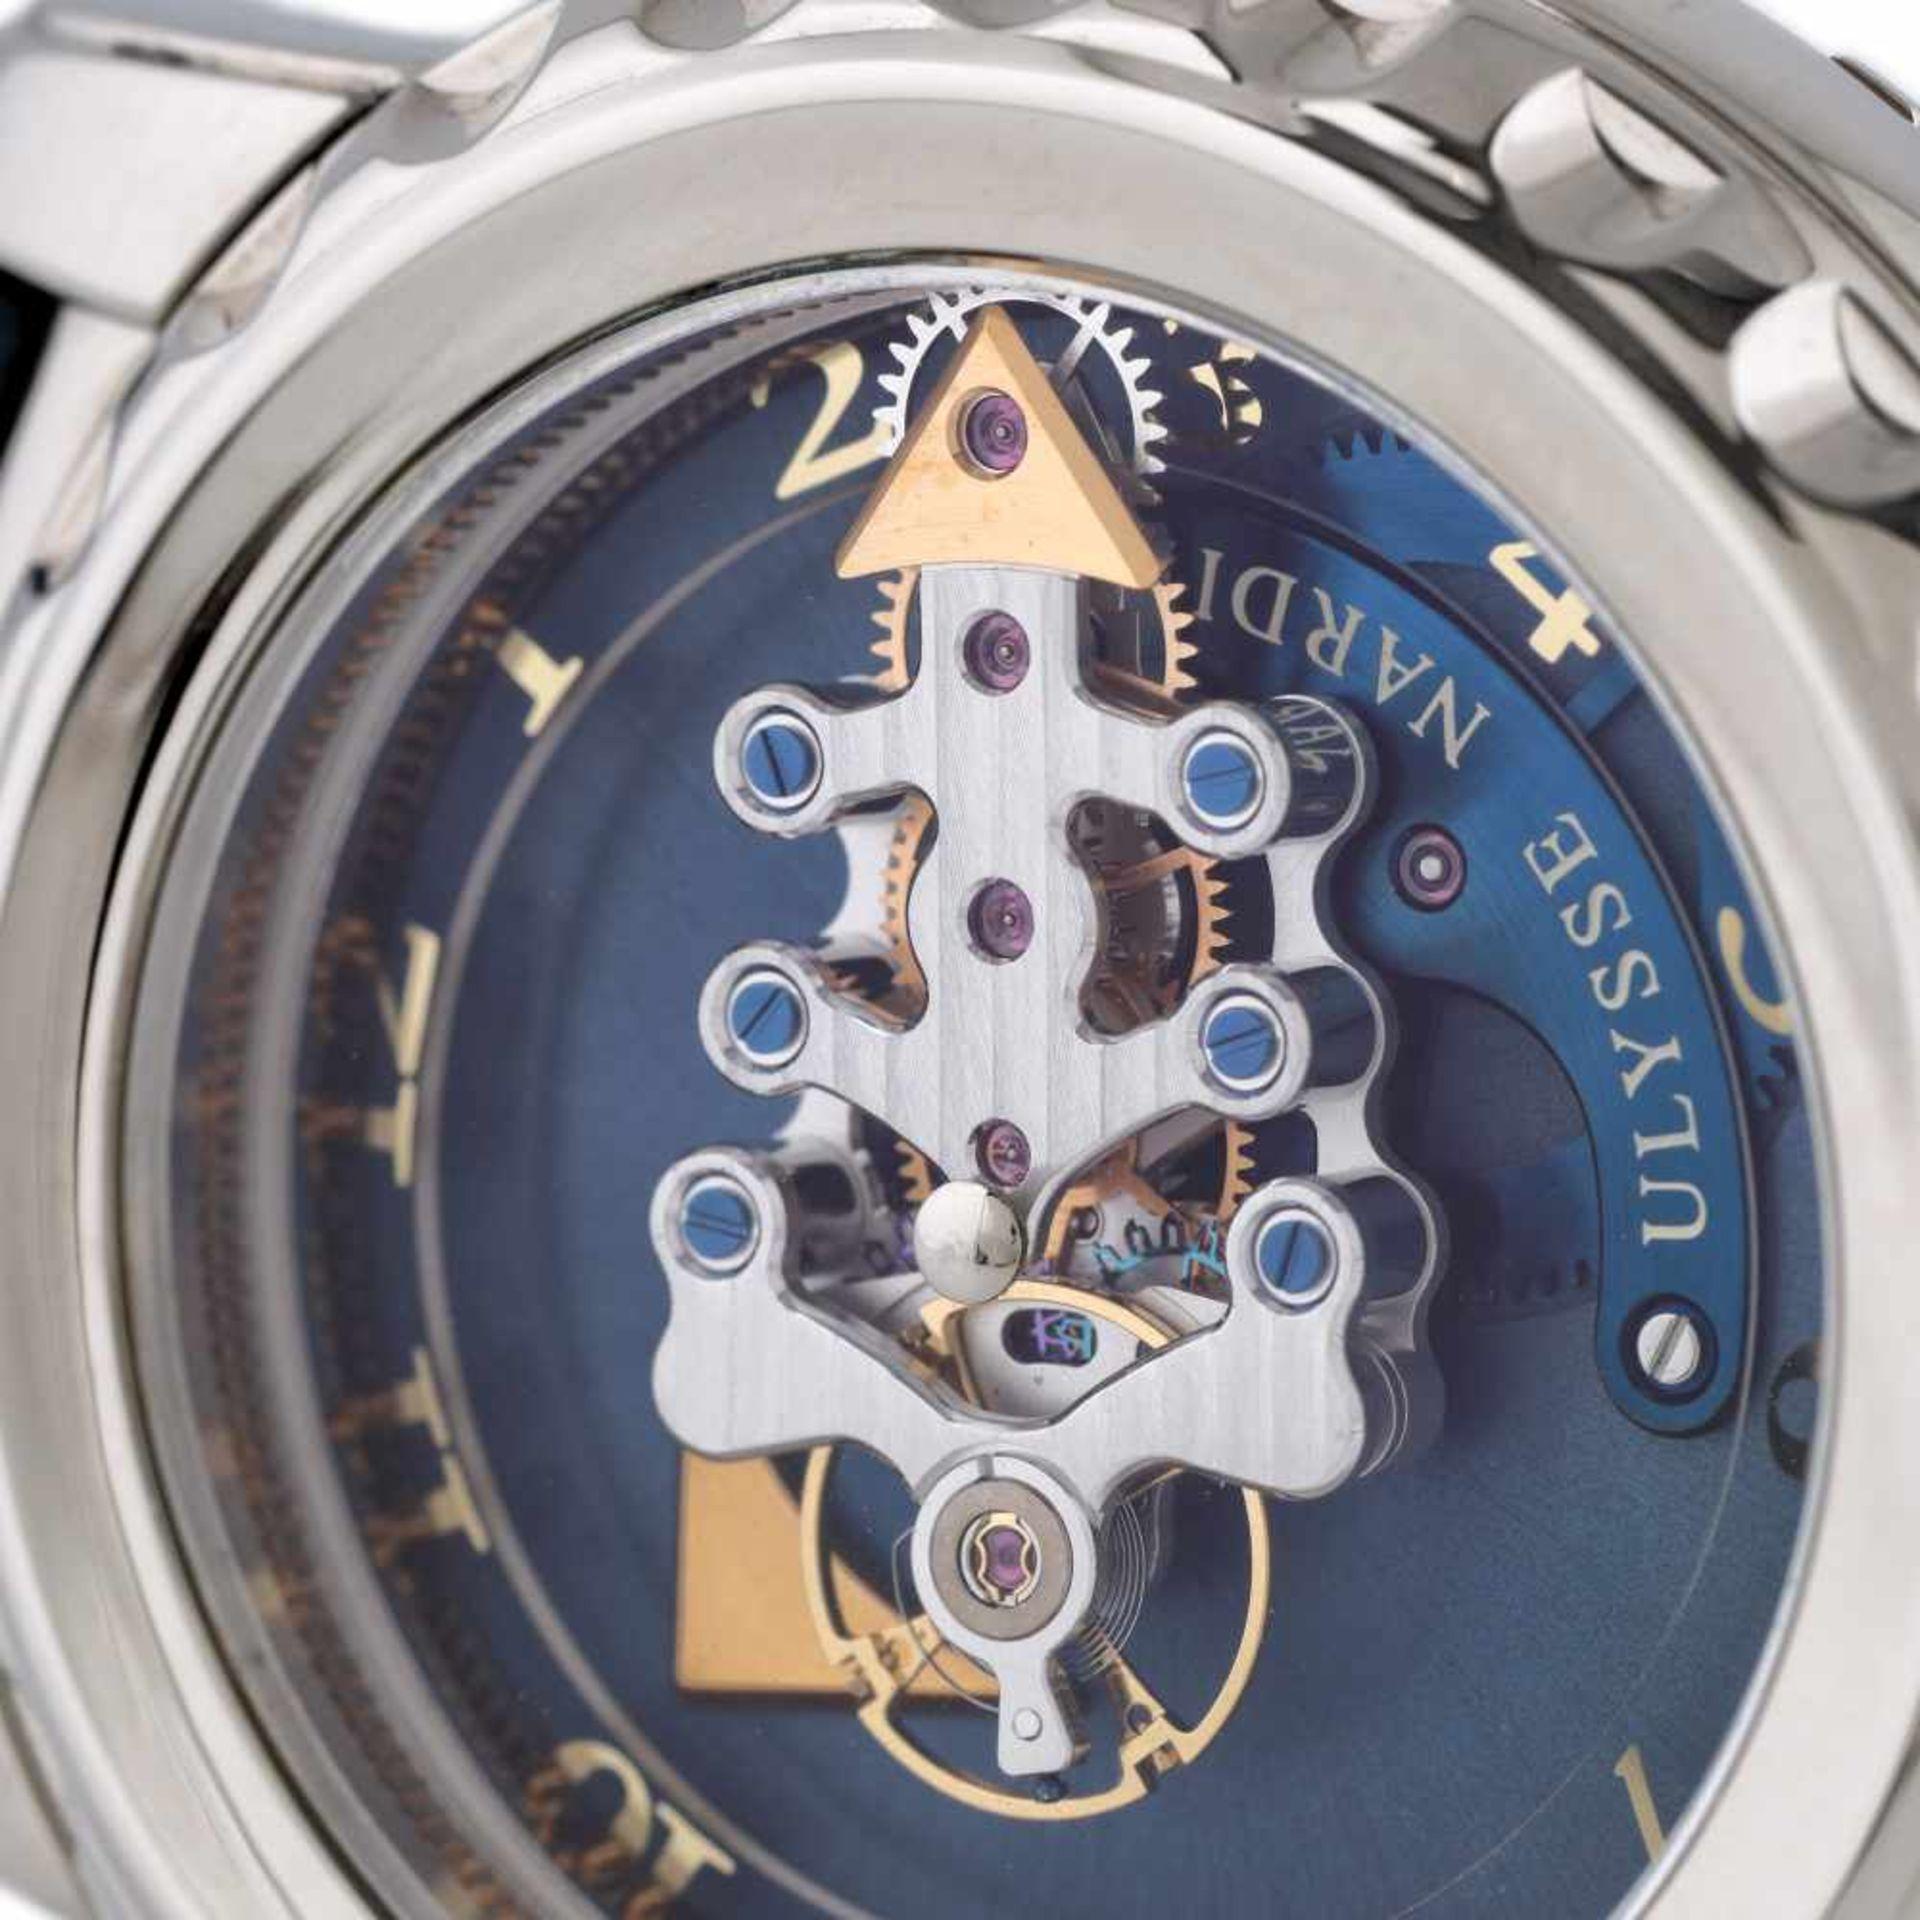 Ulysse Nardin Freak Vision Tourbillion wristwatch, white gold, men, provenance documents and origina - Bild 2 aus 4